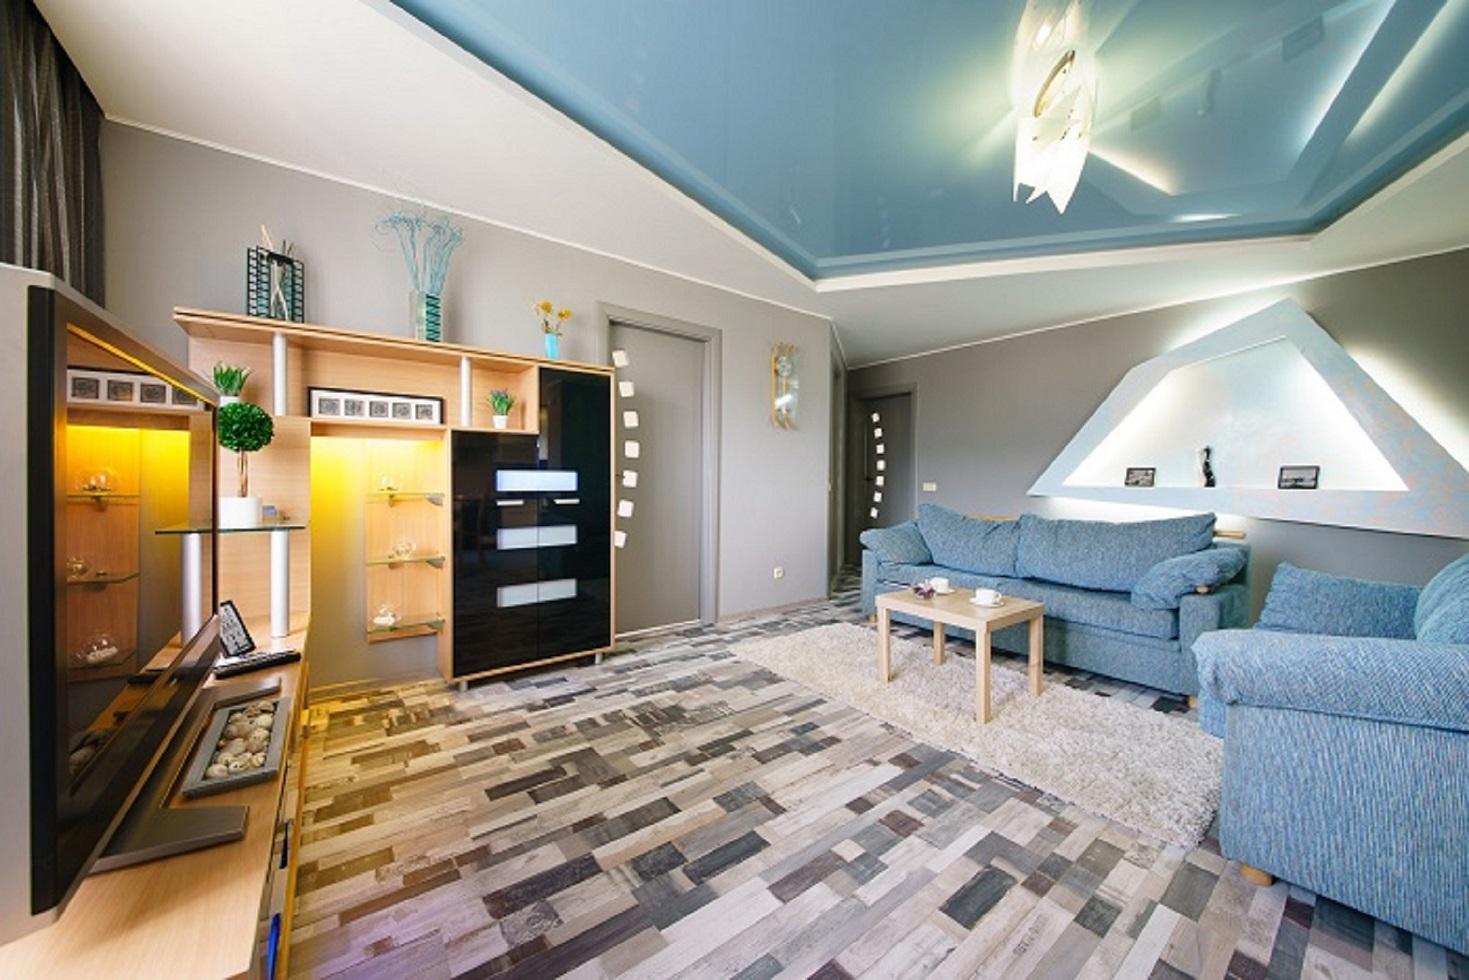 PaulMarie Apartments On Voinov Internatsionalistov